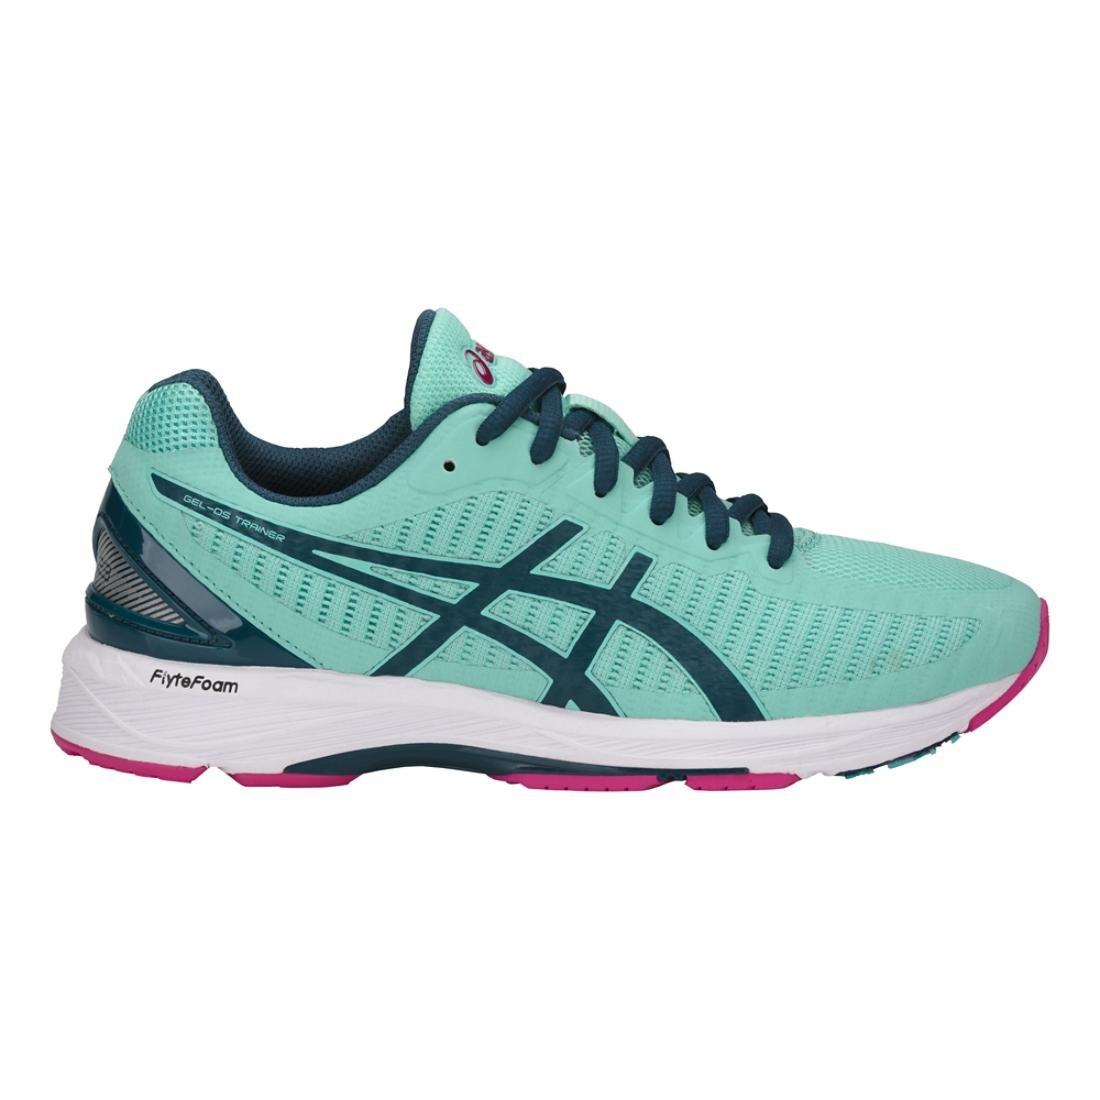 ASICS Womens Gel-DS Trainer 23 B071S6VH4Q 6.5 B(M) US|Aruba Blue/Ink Blue/Fuchsia Purple